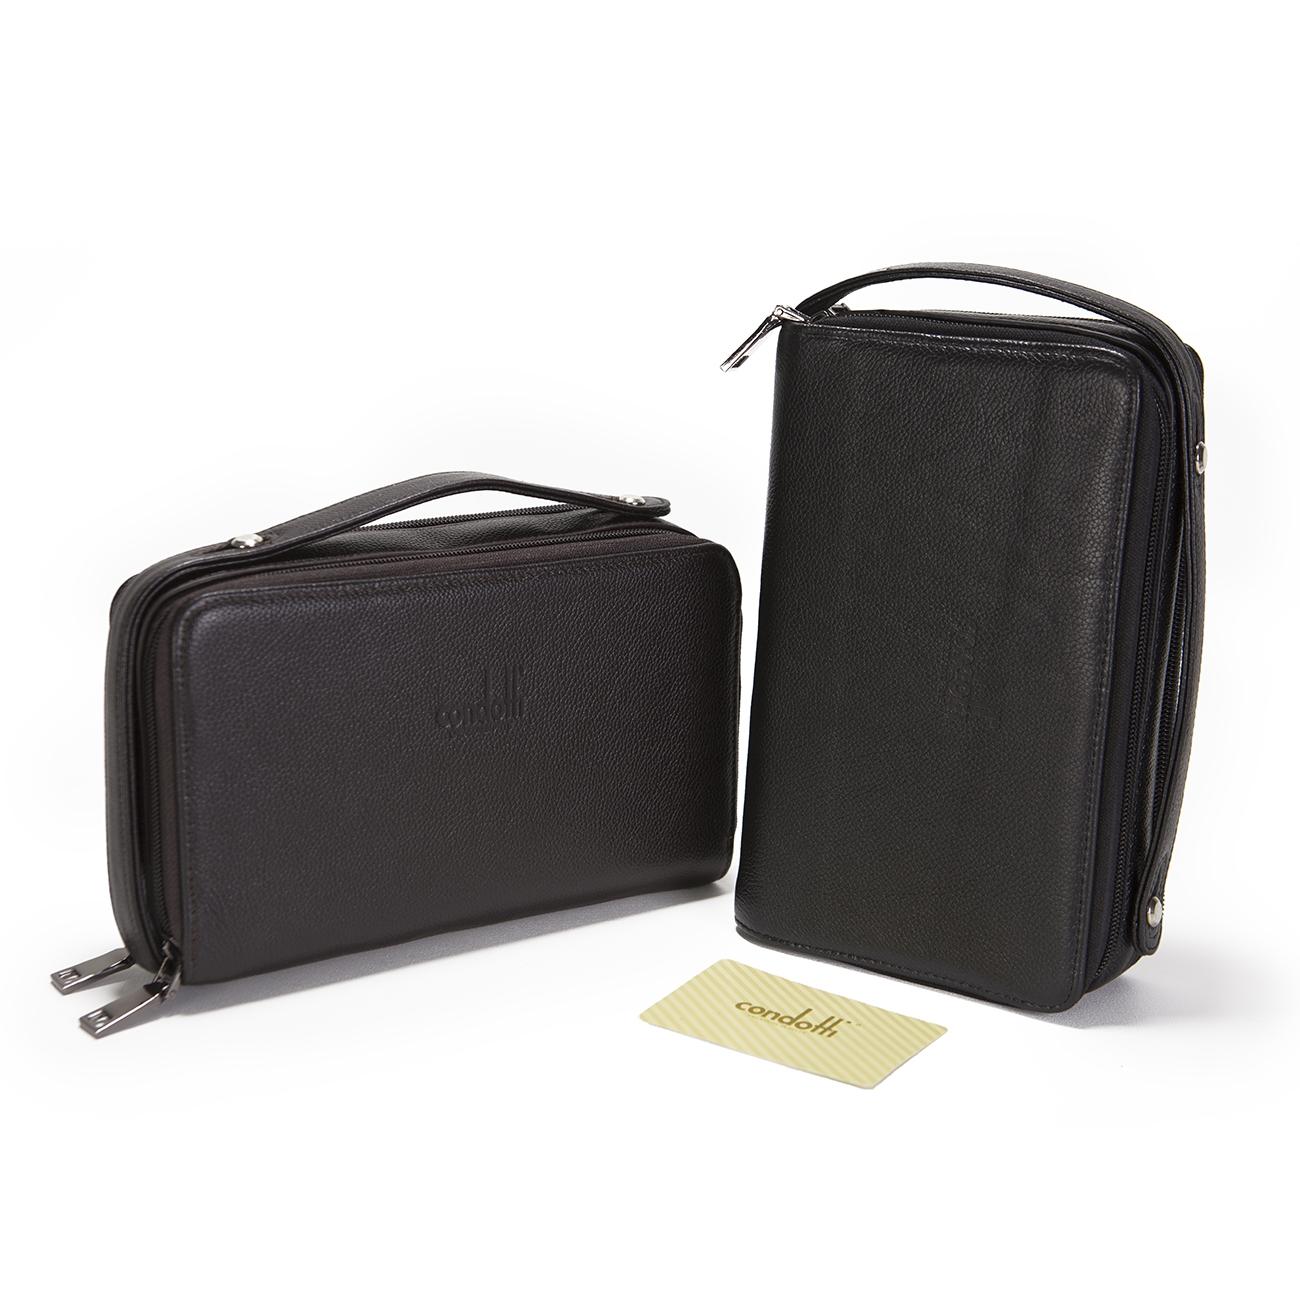 Credit Card Wallet - CODE 142-1602